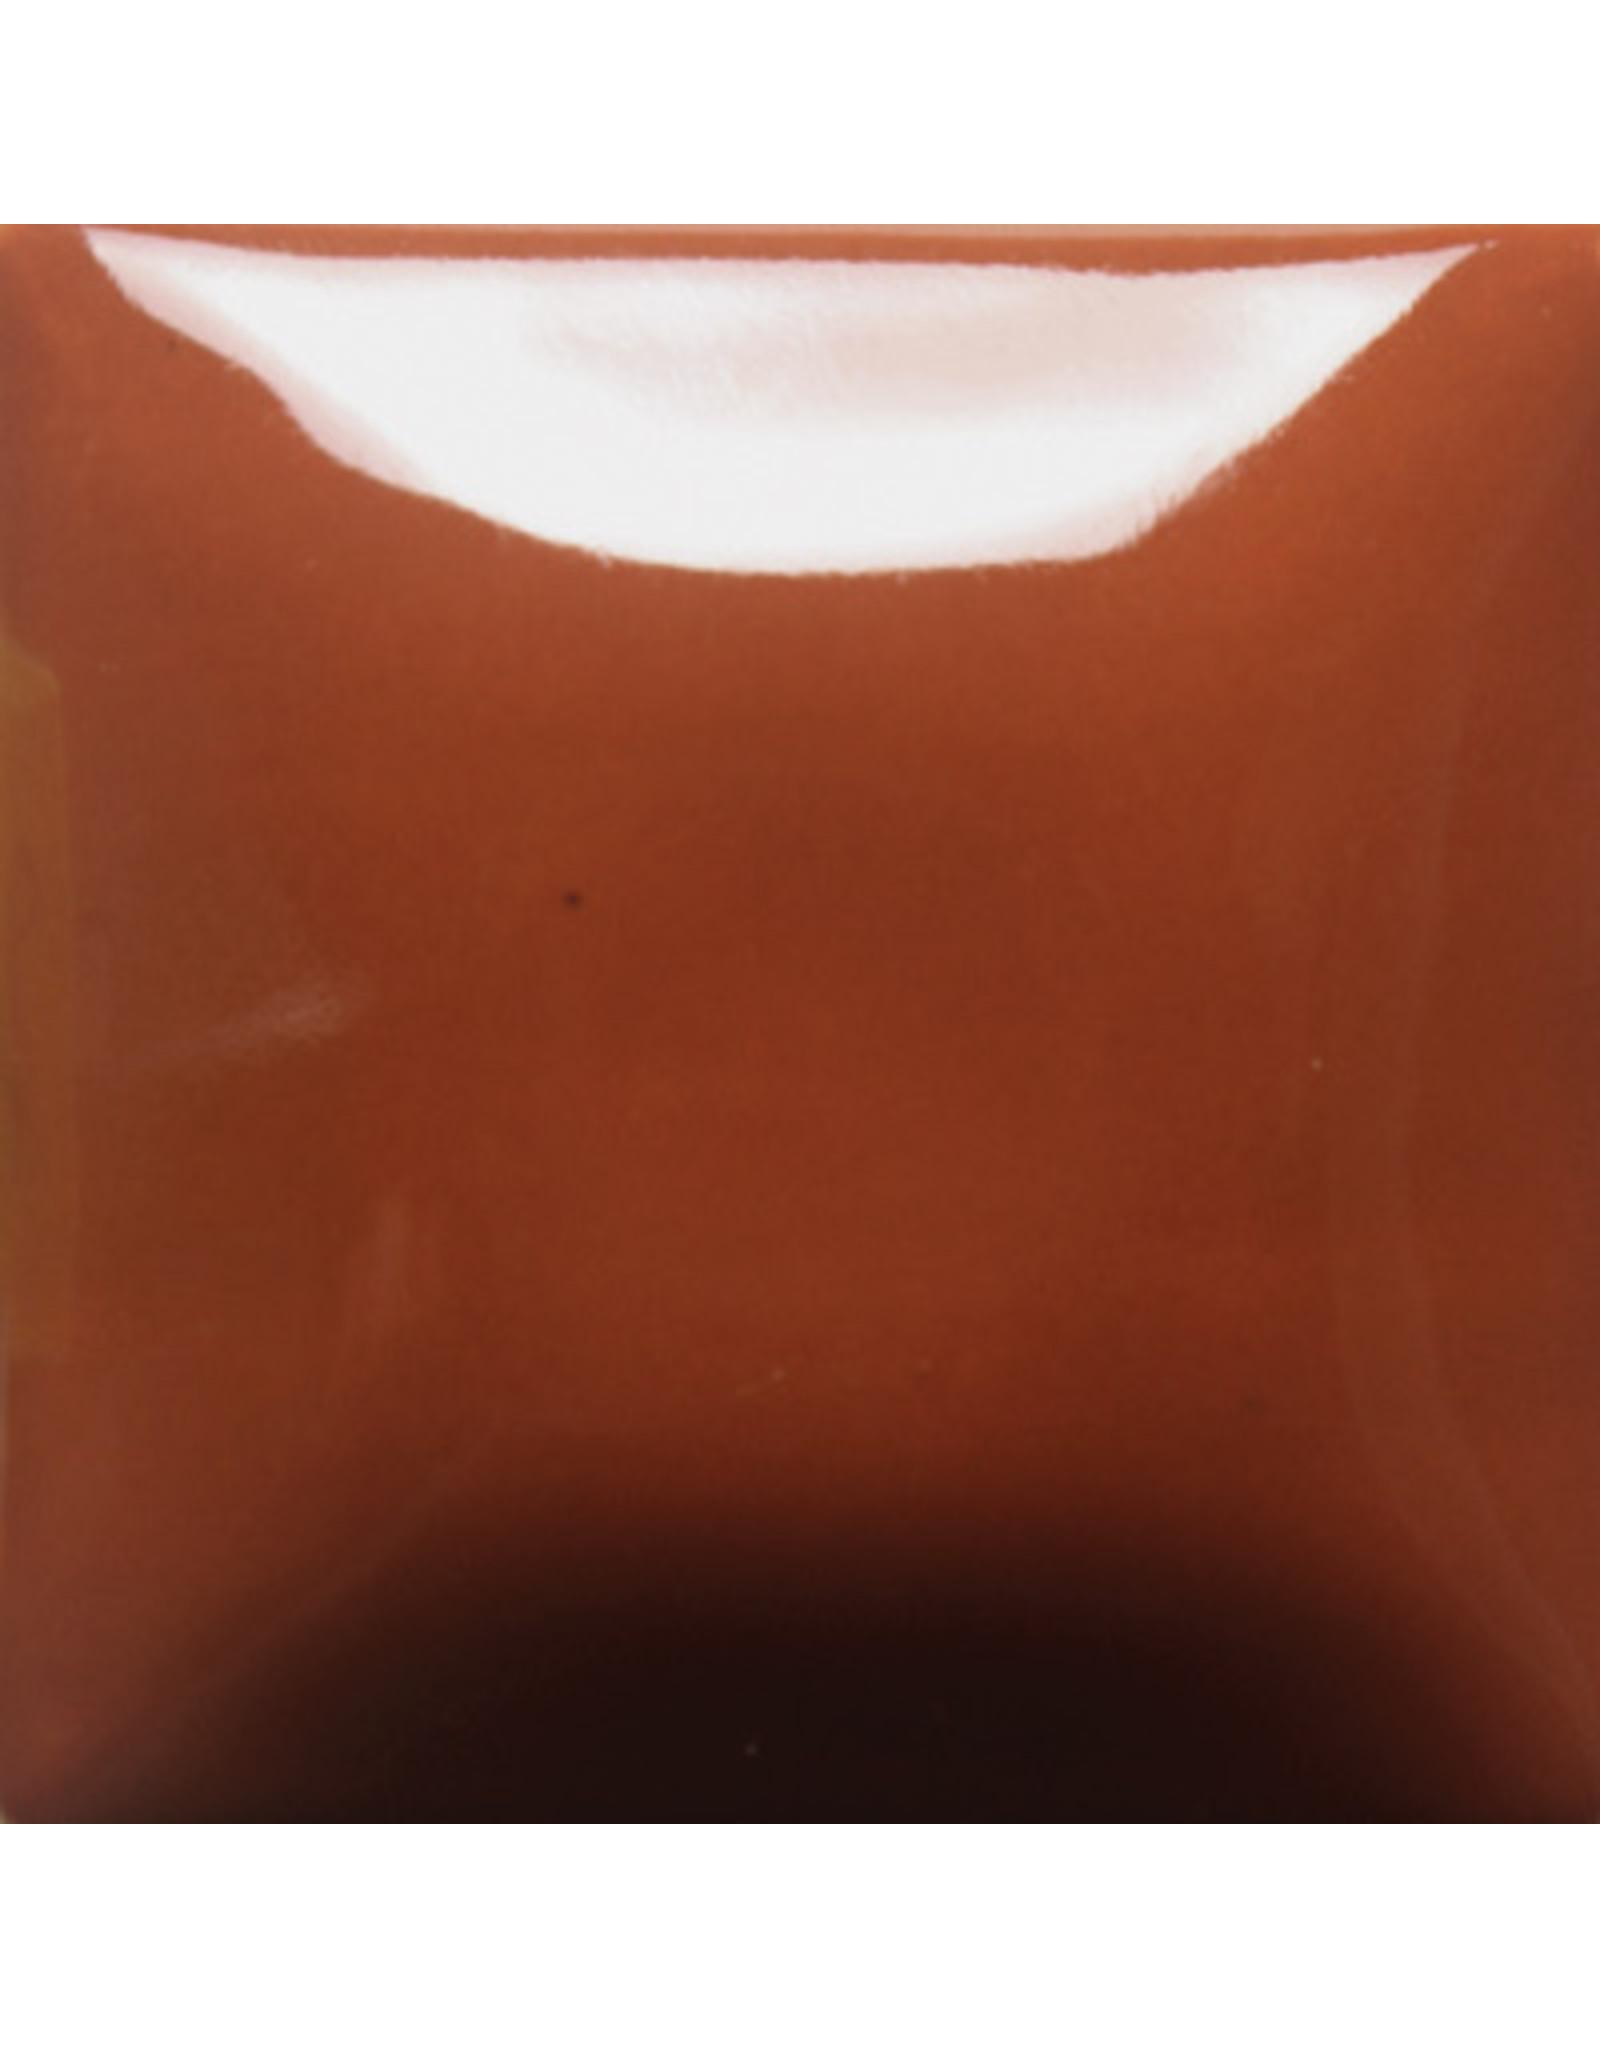 Mayco Mayco Foundations Cinnamon 473ml